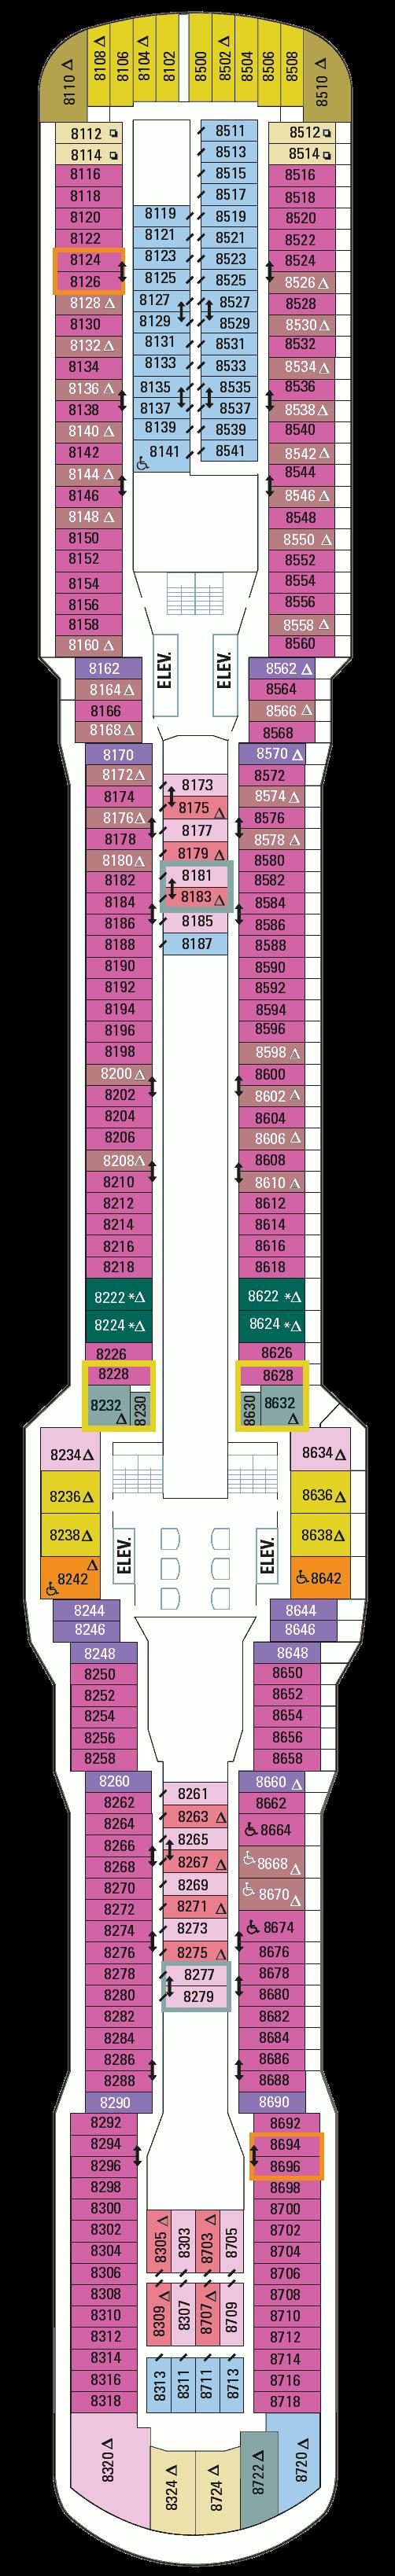 Ovation of the Seas Deck 8